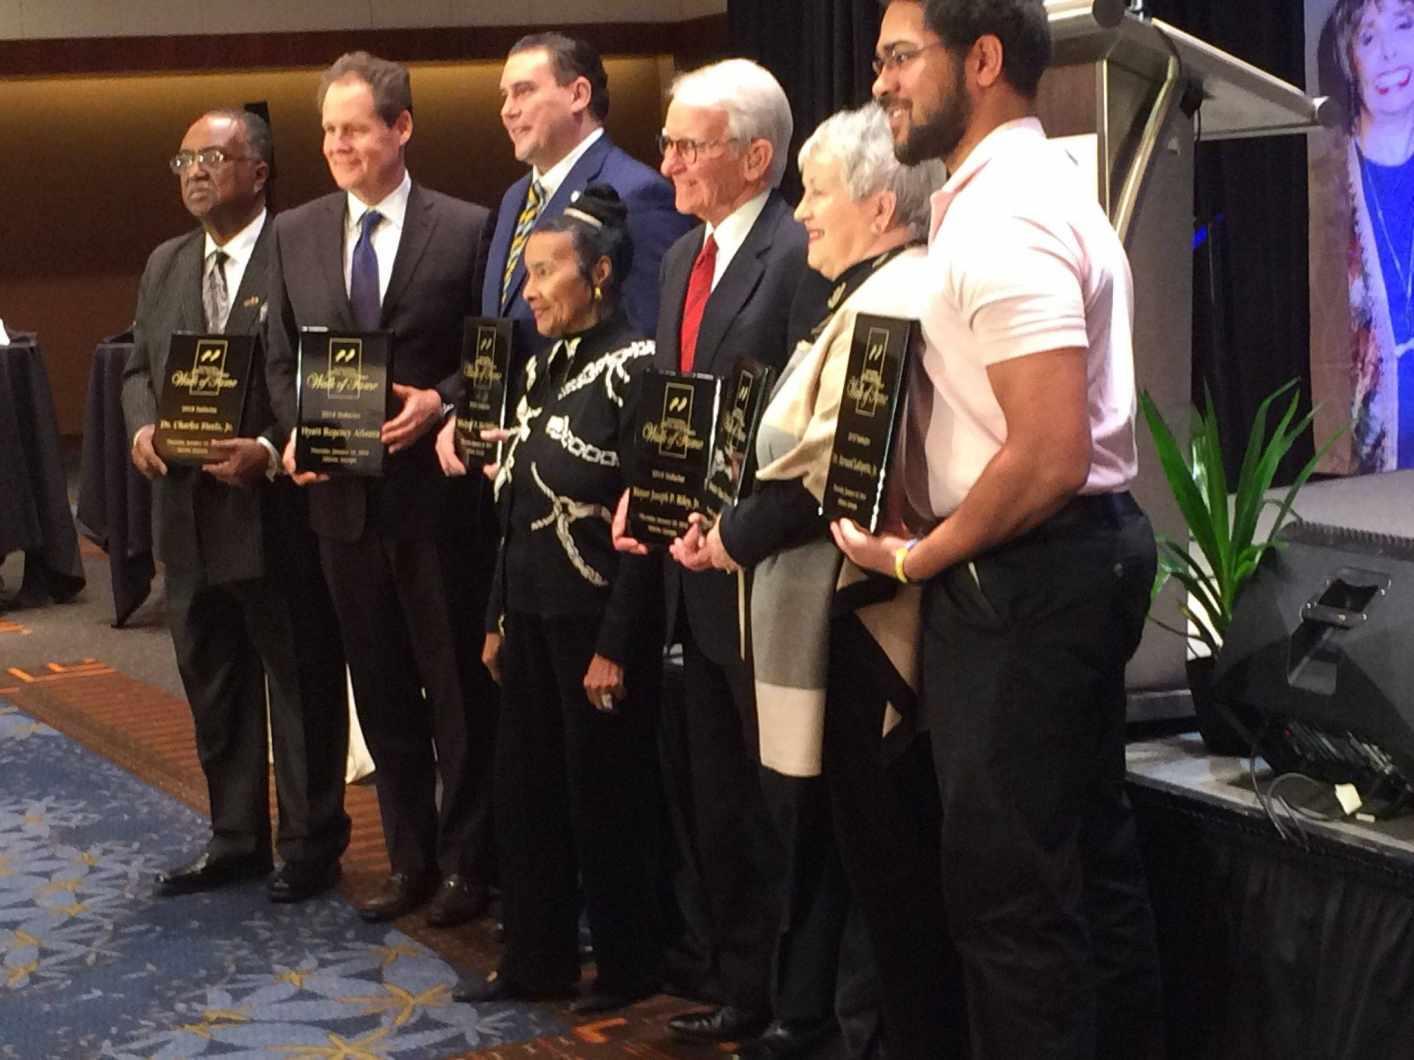 Trumpet Awards Foundation International Civil Rights Walk of Fame